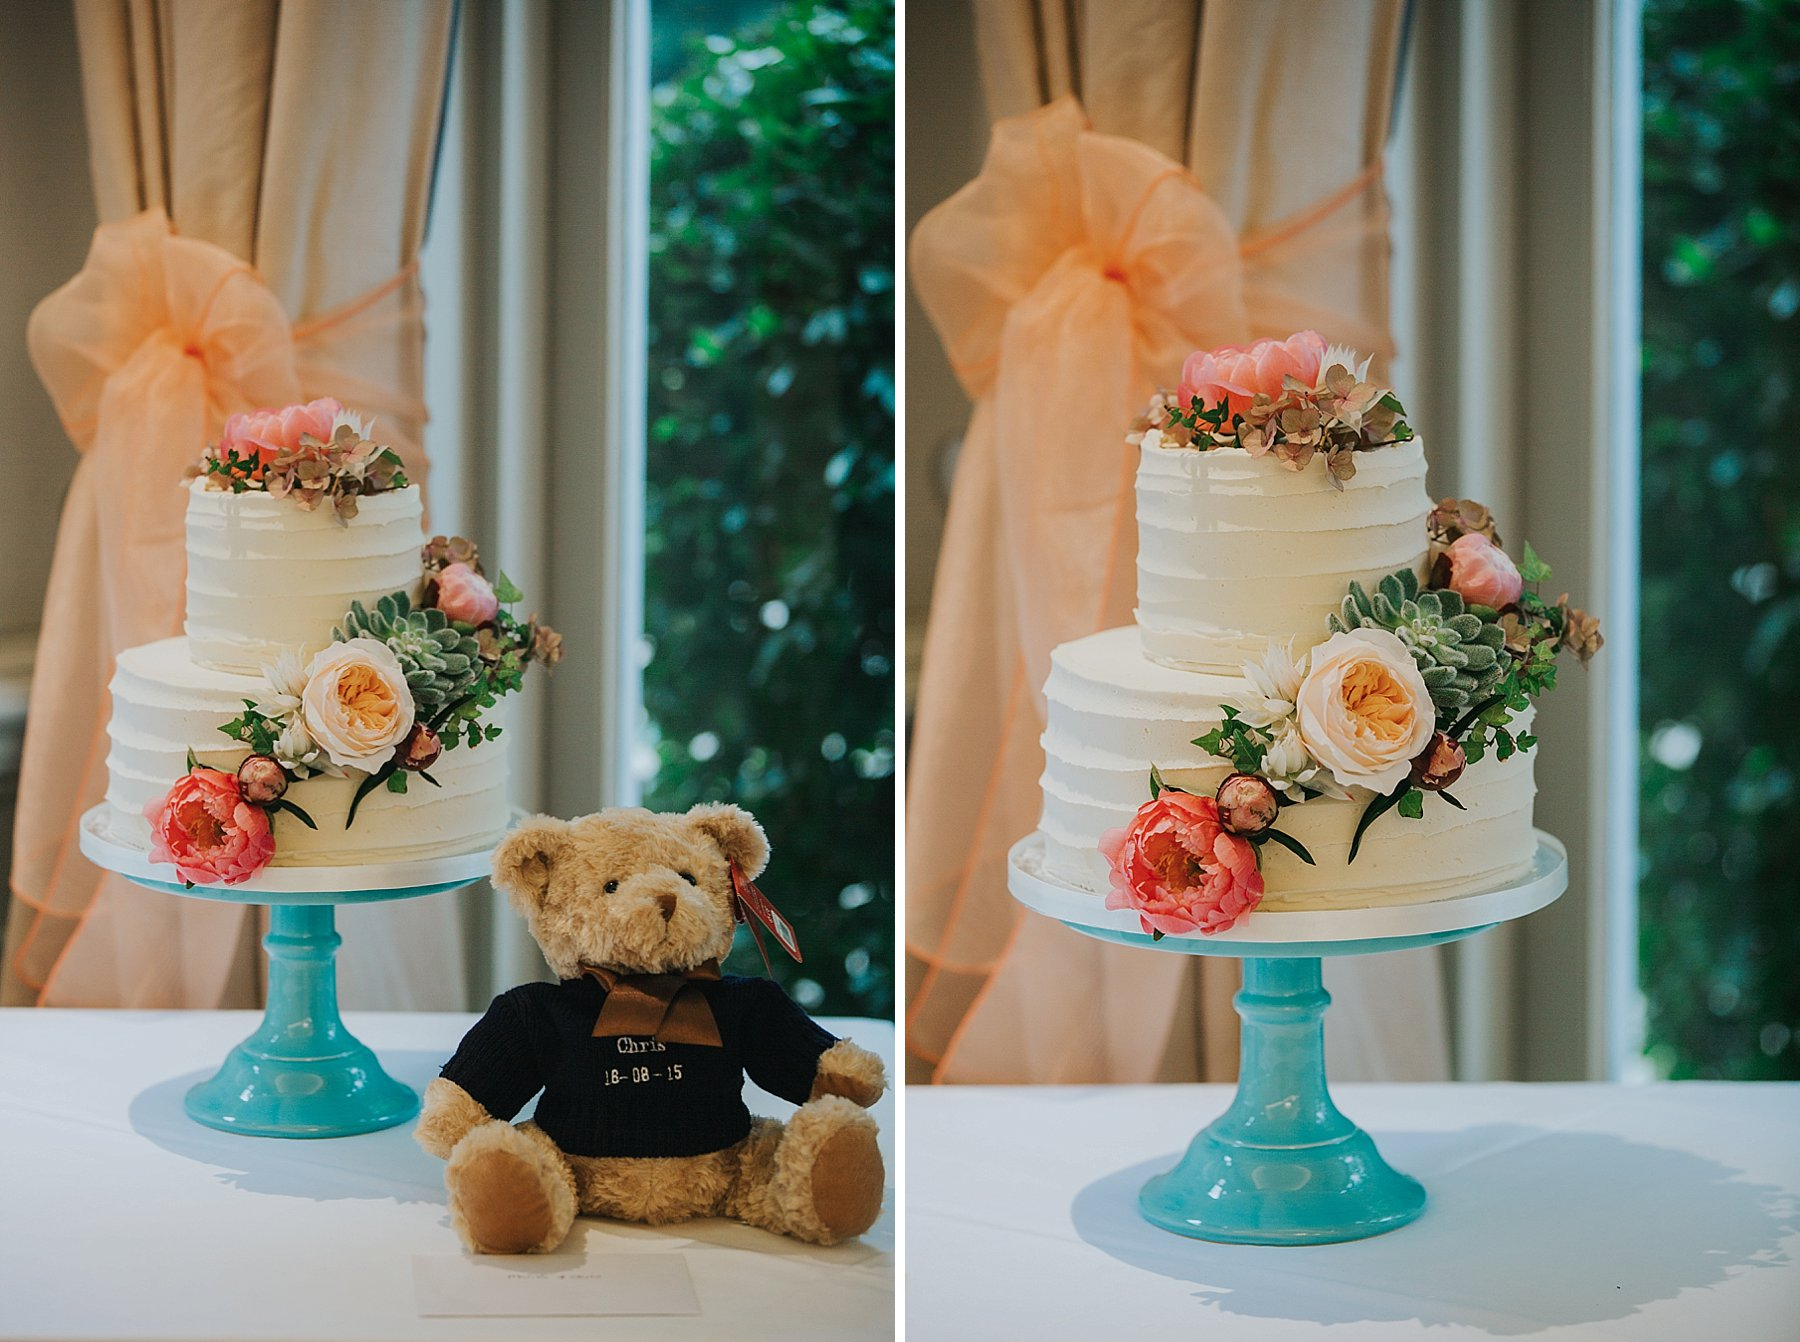 382 succulent peonie wedding cake with teddy bear Woodlands Hotel Surrey.jpg